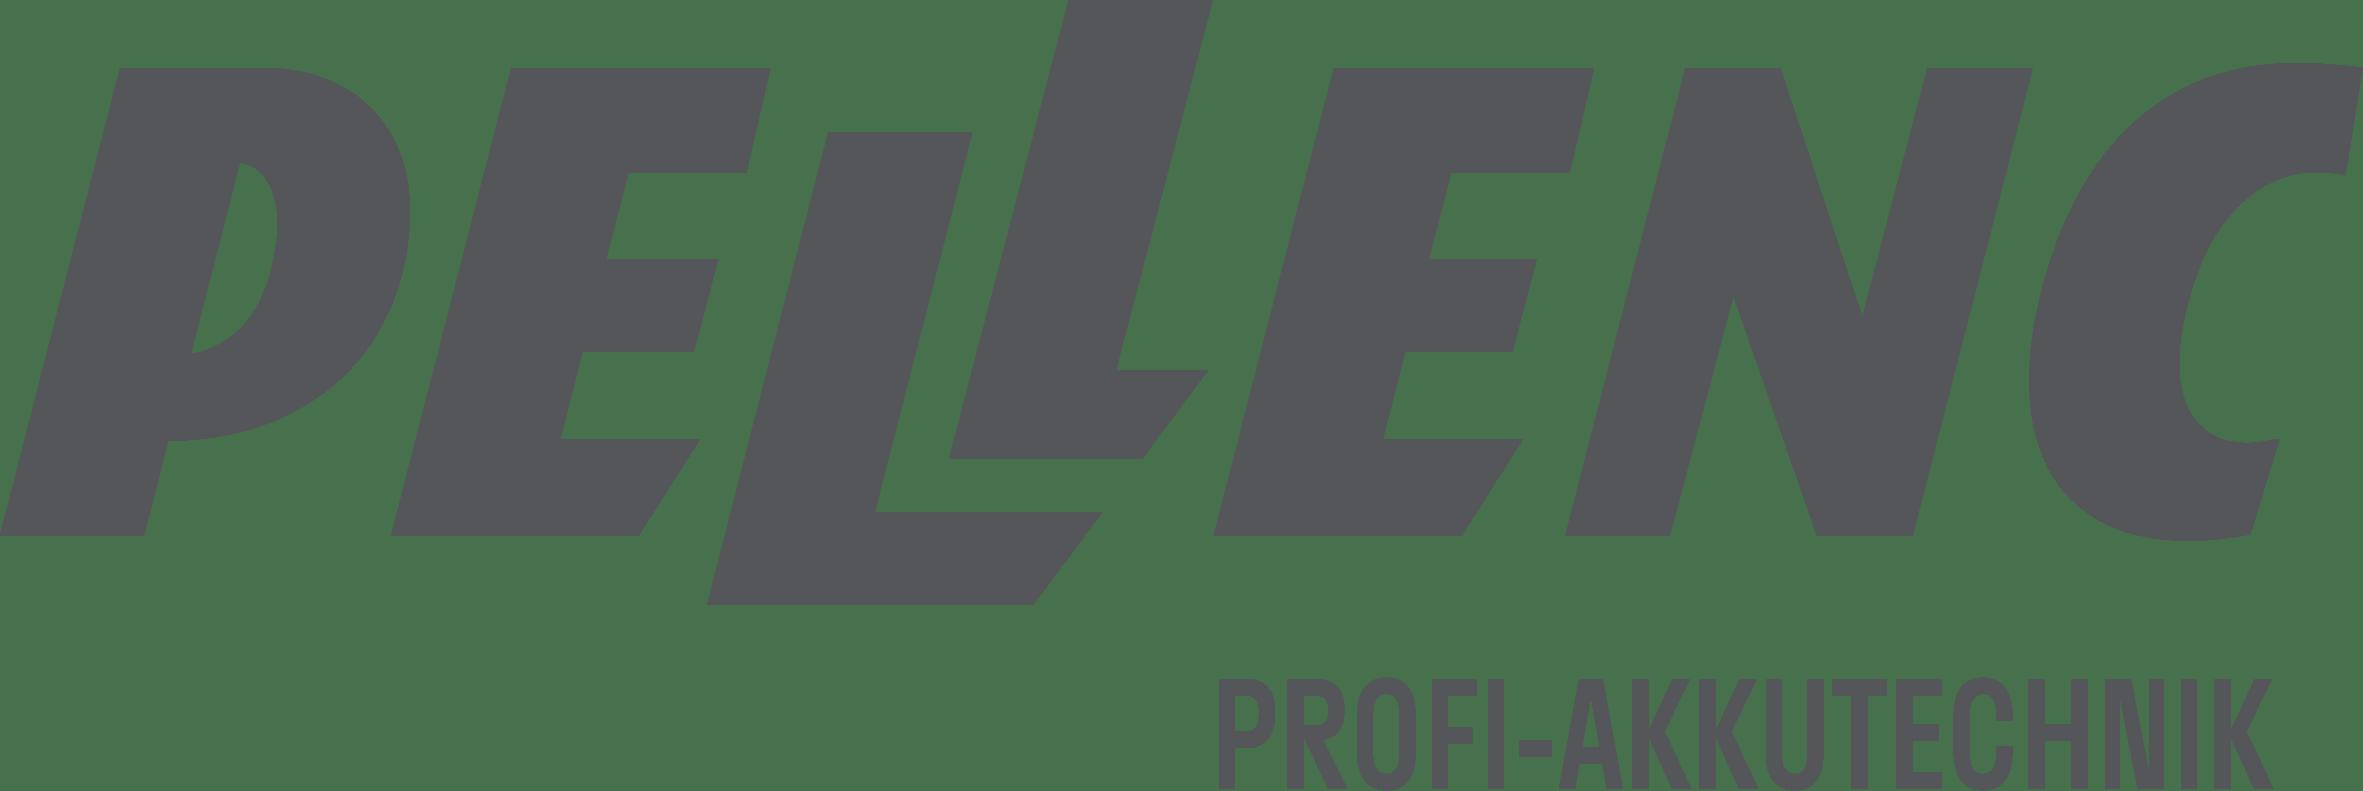 Pellenc_logo